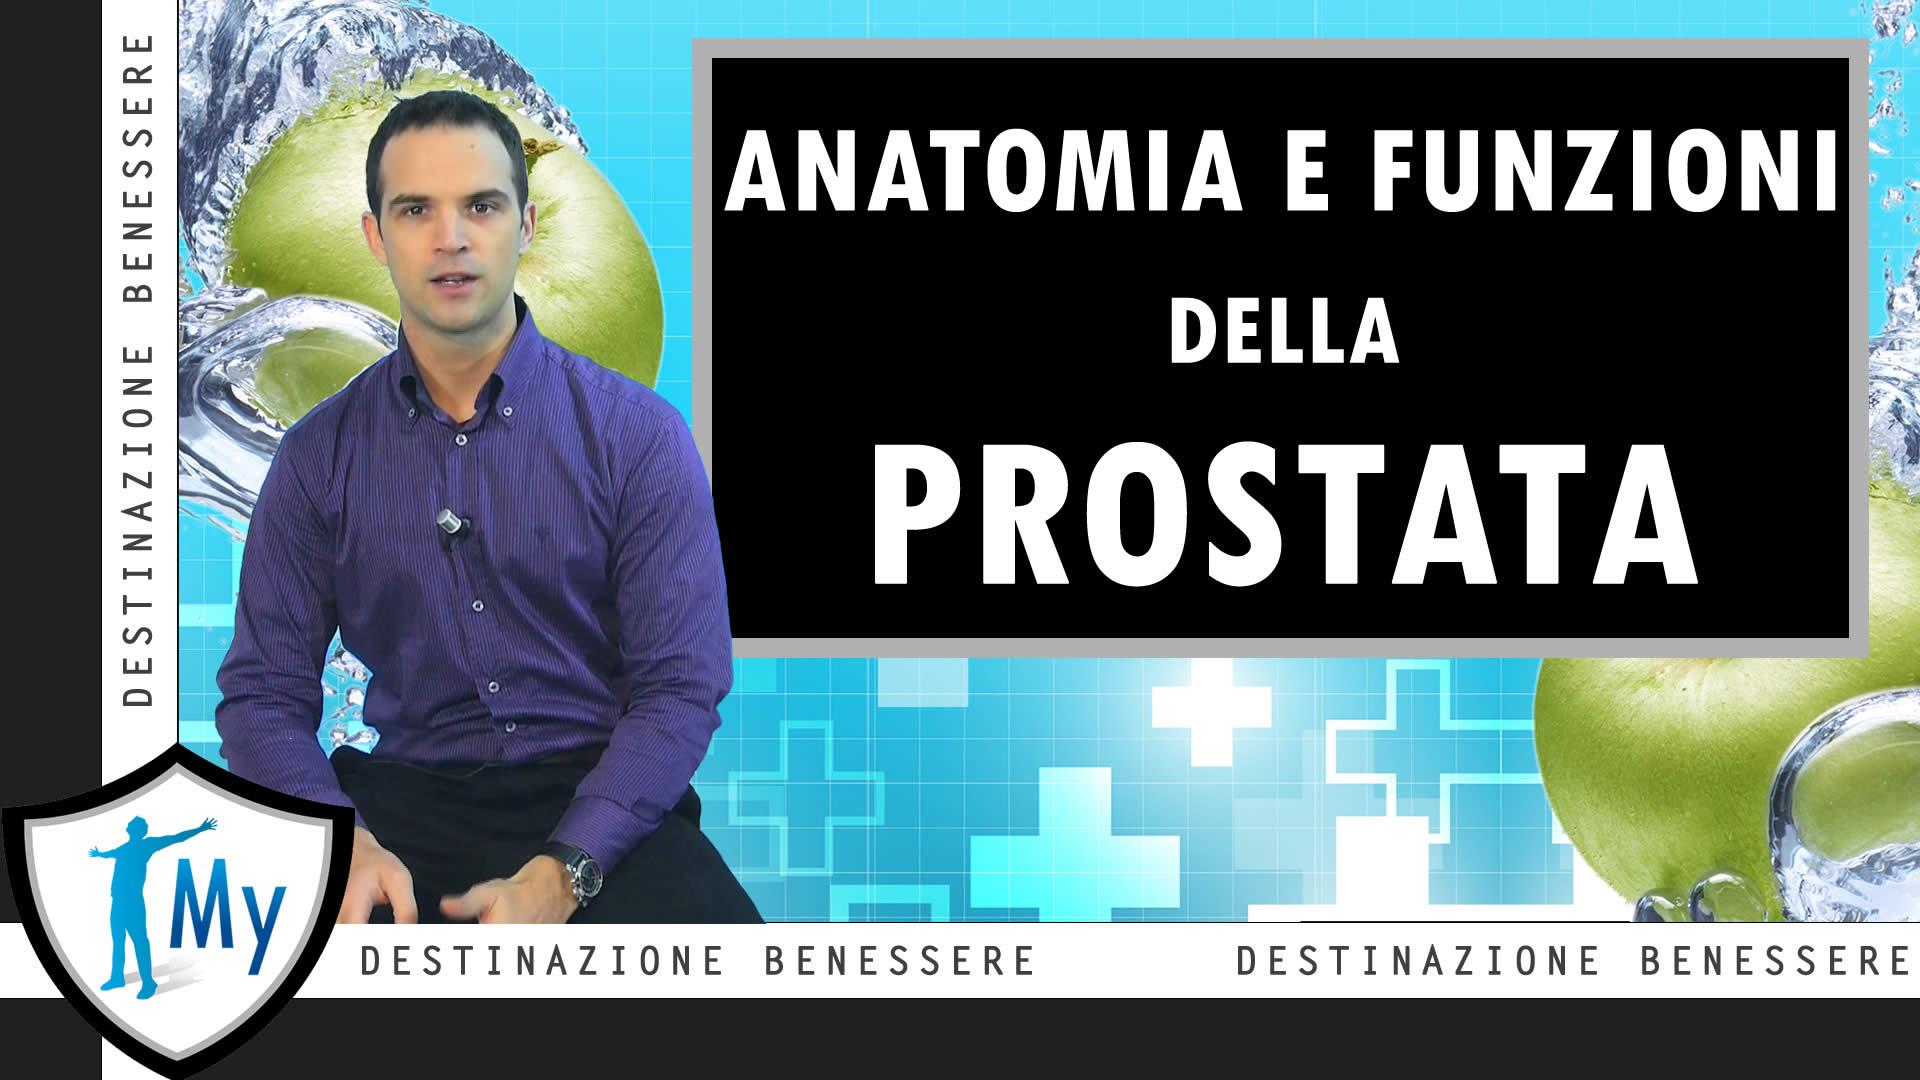 anatomia topografica prostata